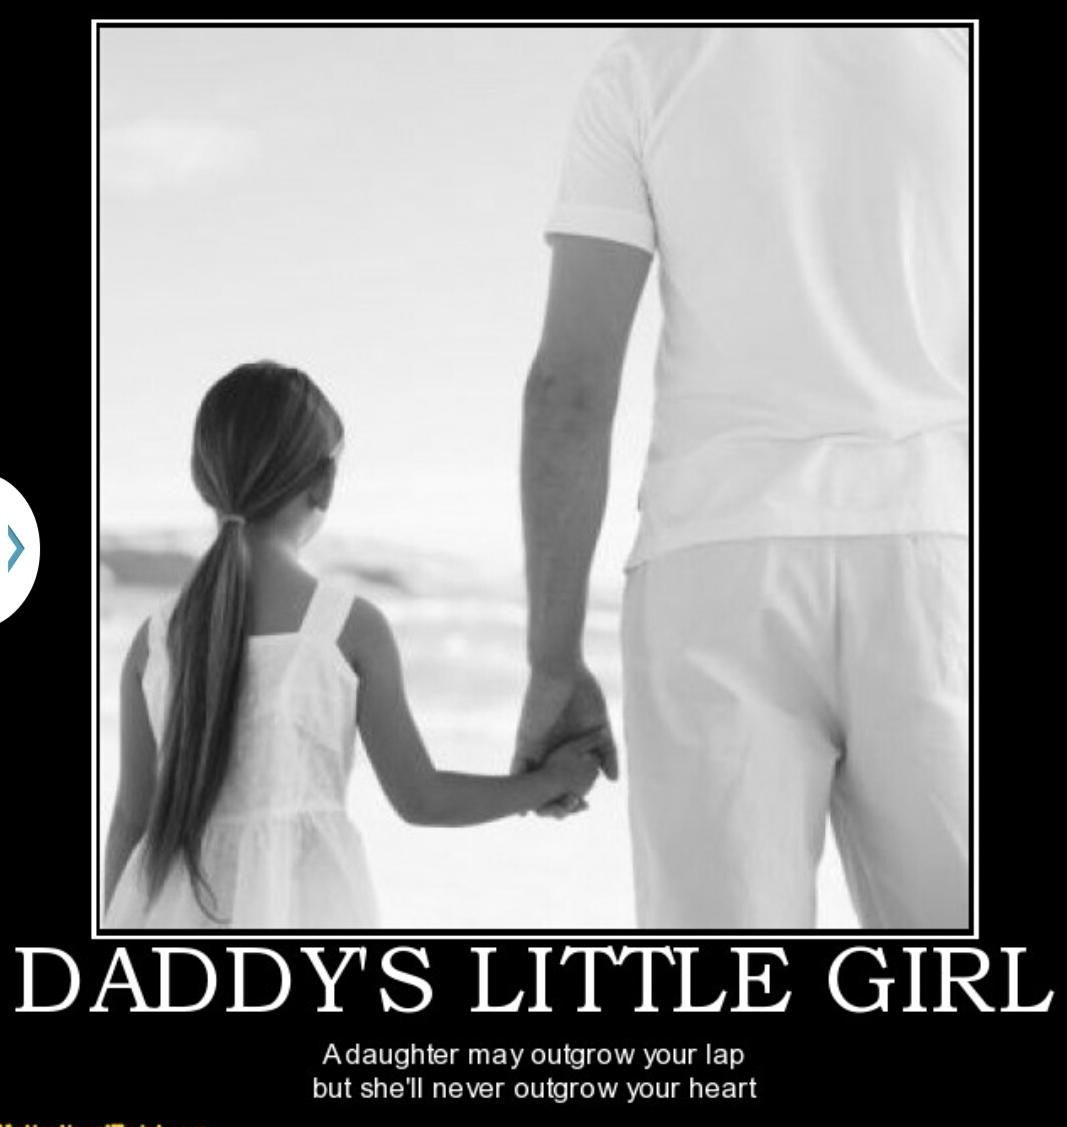 Daddy daughter relationship bdsm